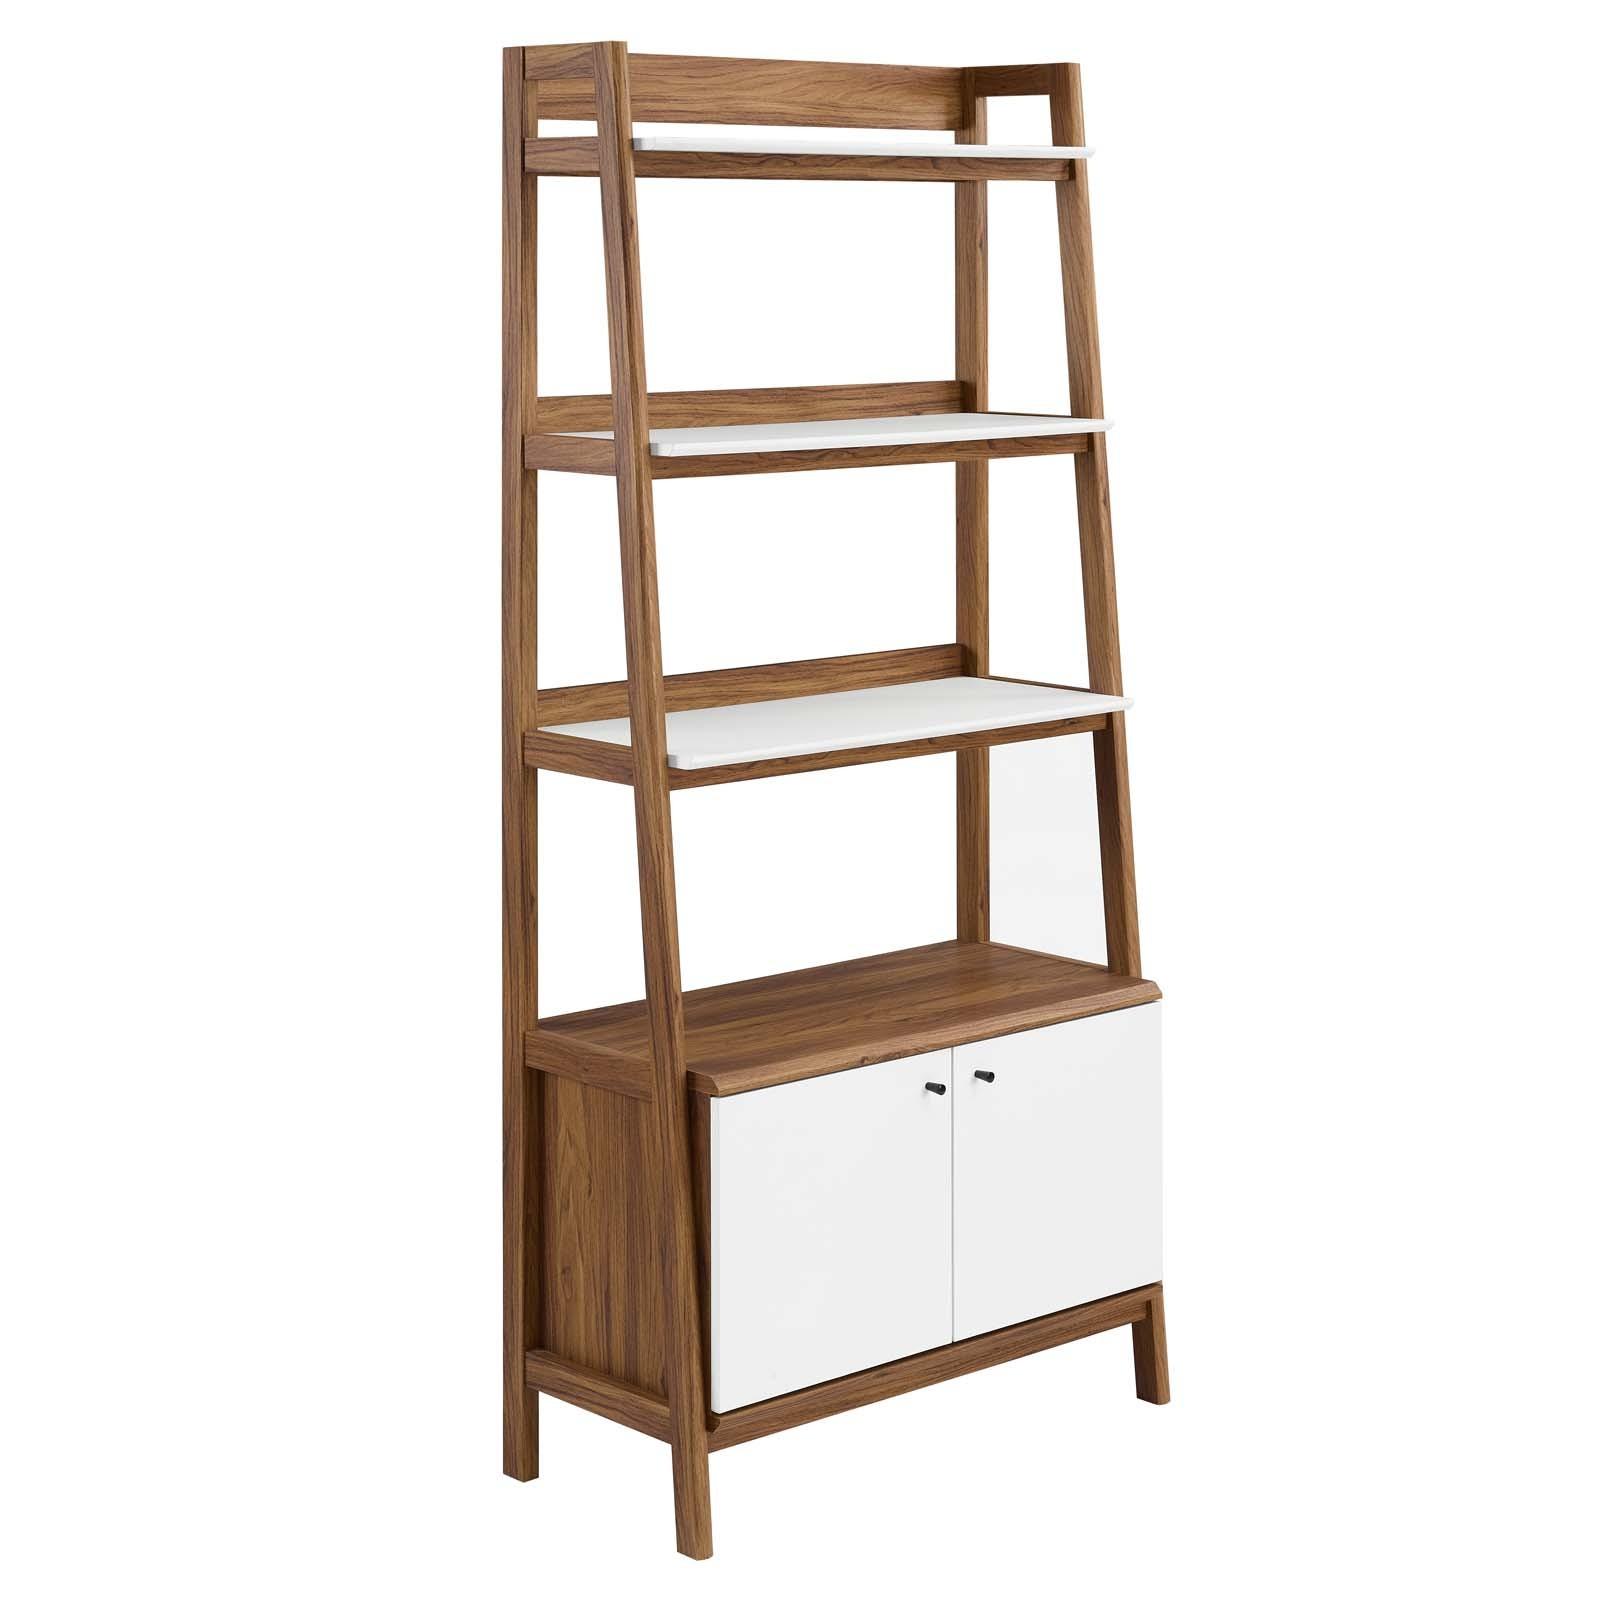 "Bixby 33"" Bookshelf in Walnut White"